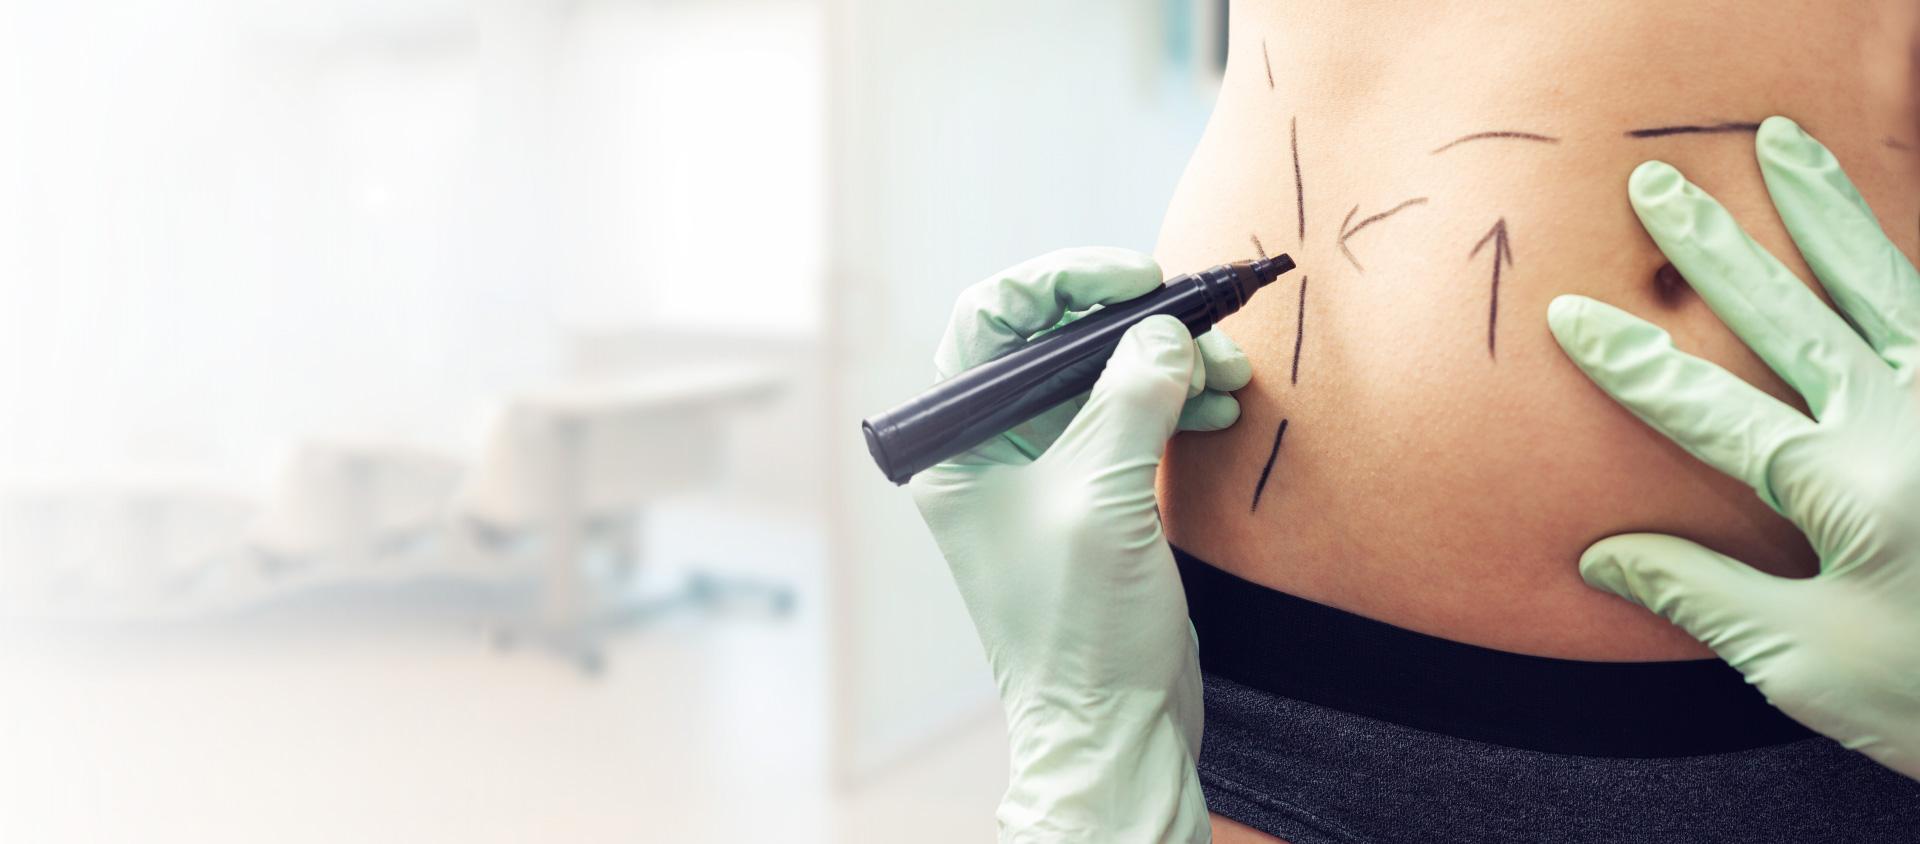 Cirurgia plástica: plano de saúde é obrigado a cumprir?